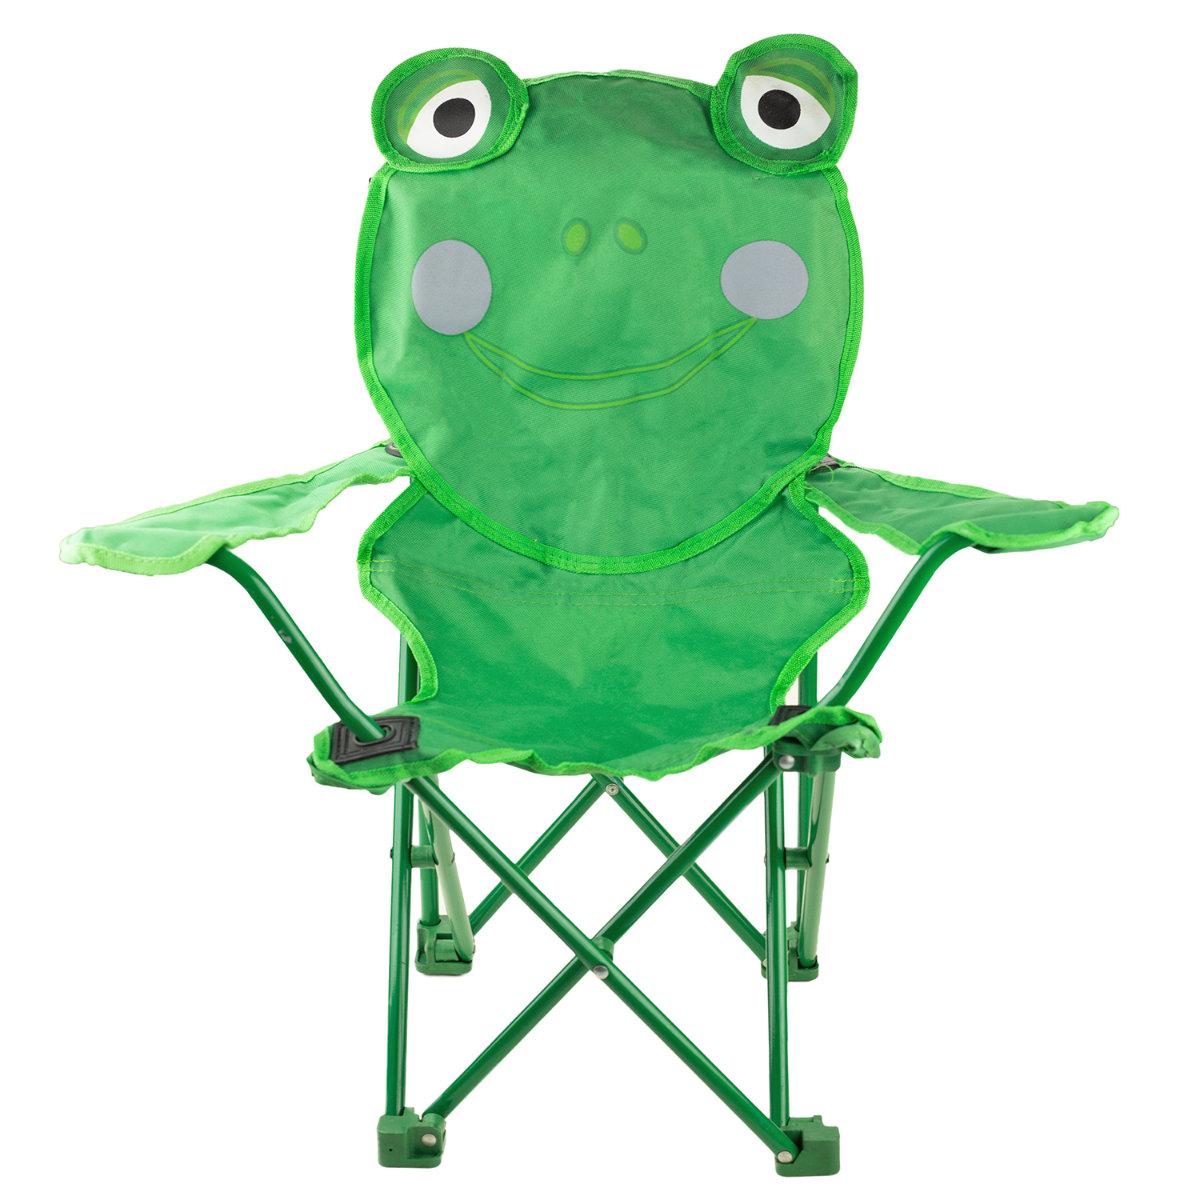 Kinder Camping Klappstuhl Gartenstuhl Kalatex Klappstuhl für Kinder Frosch